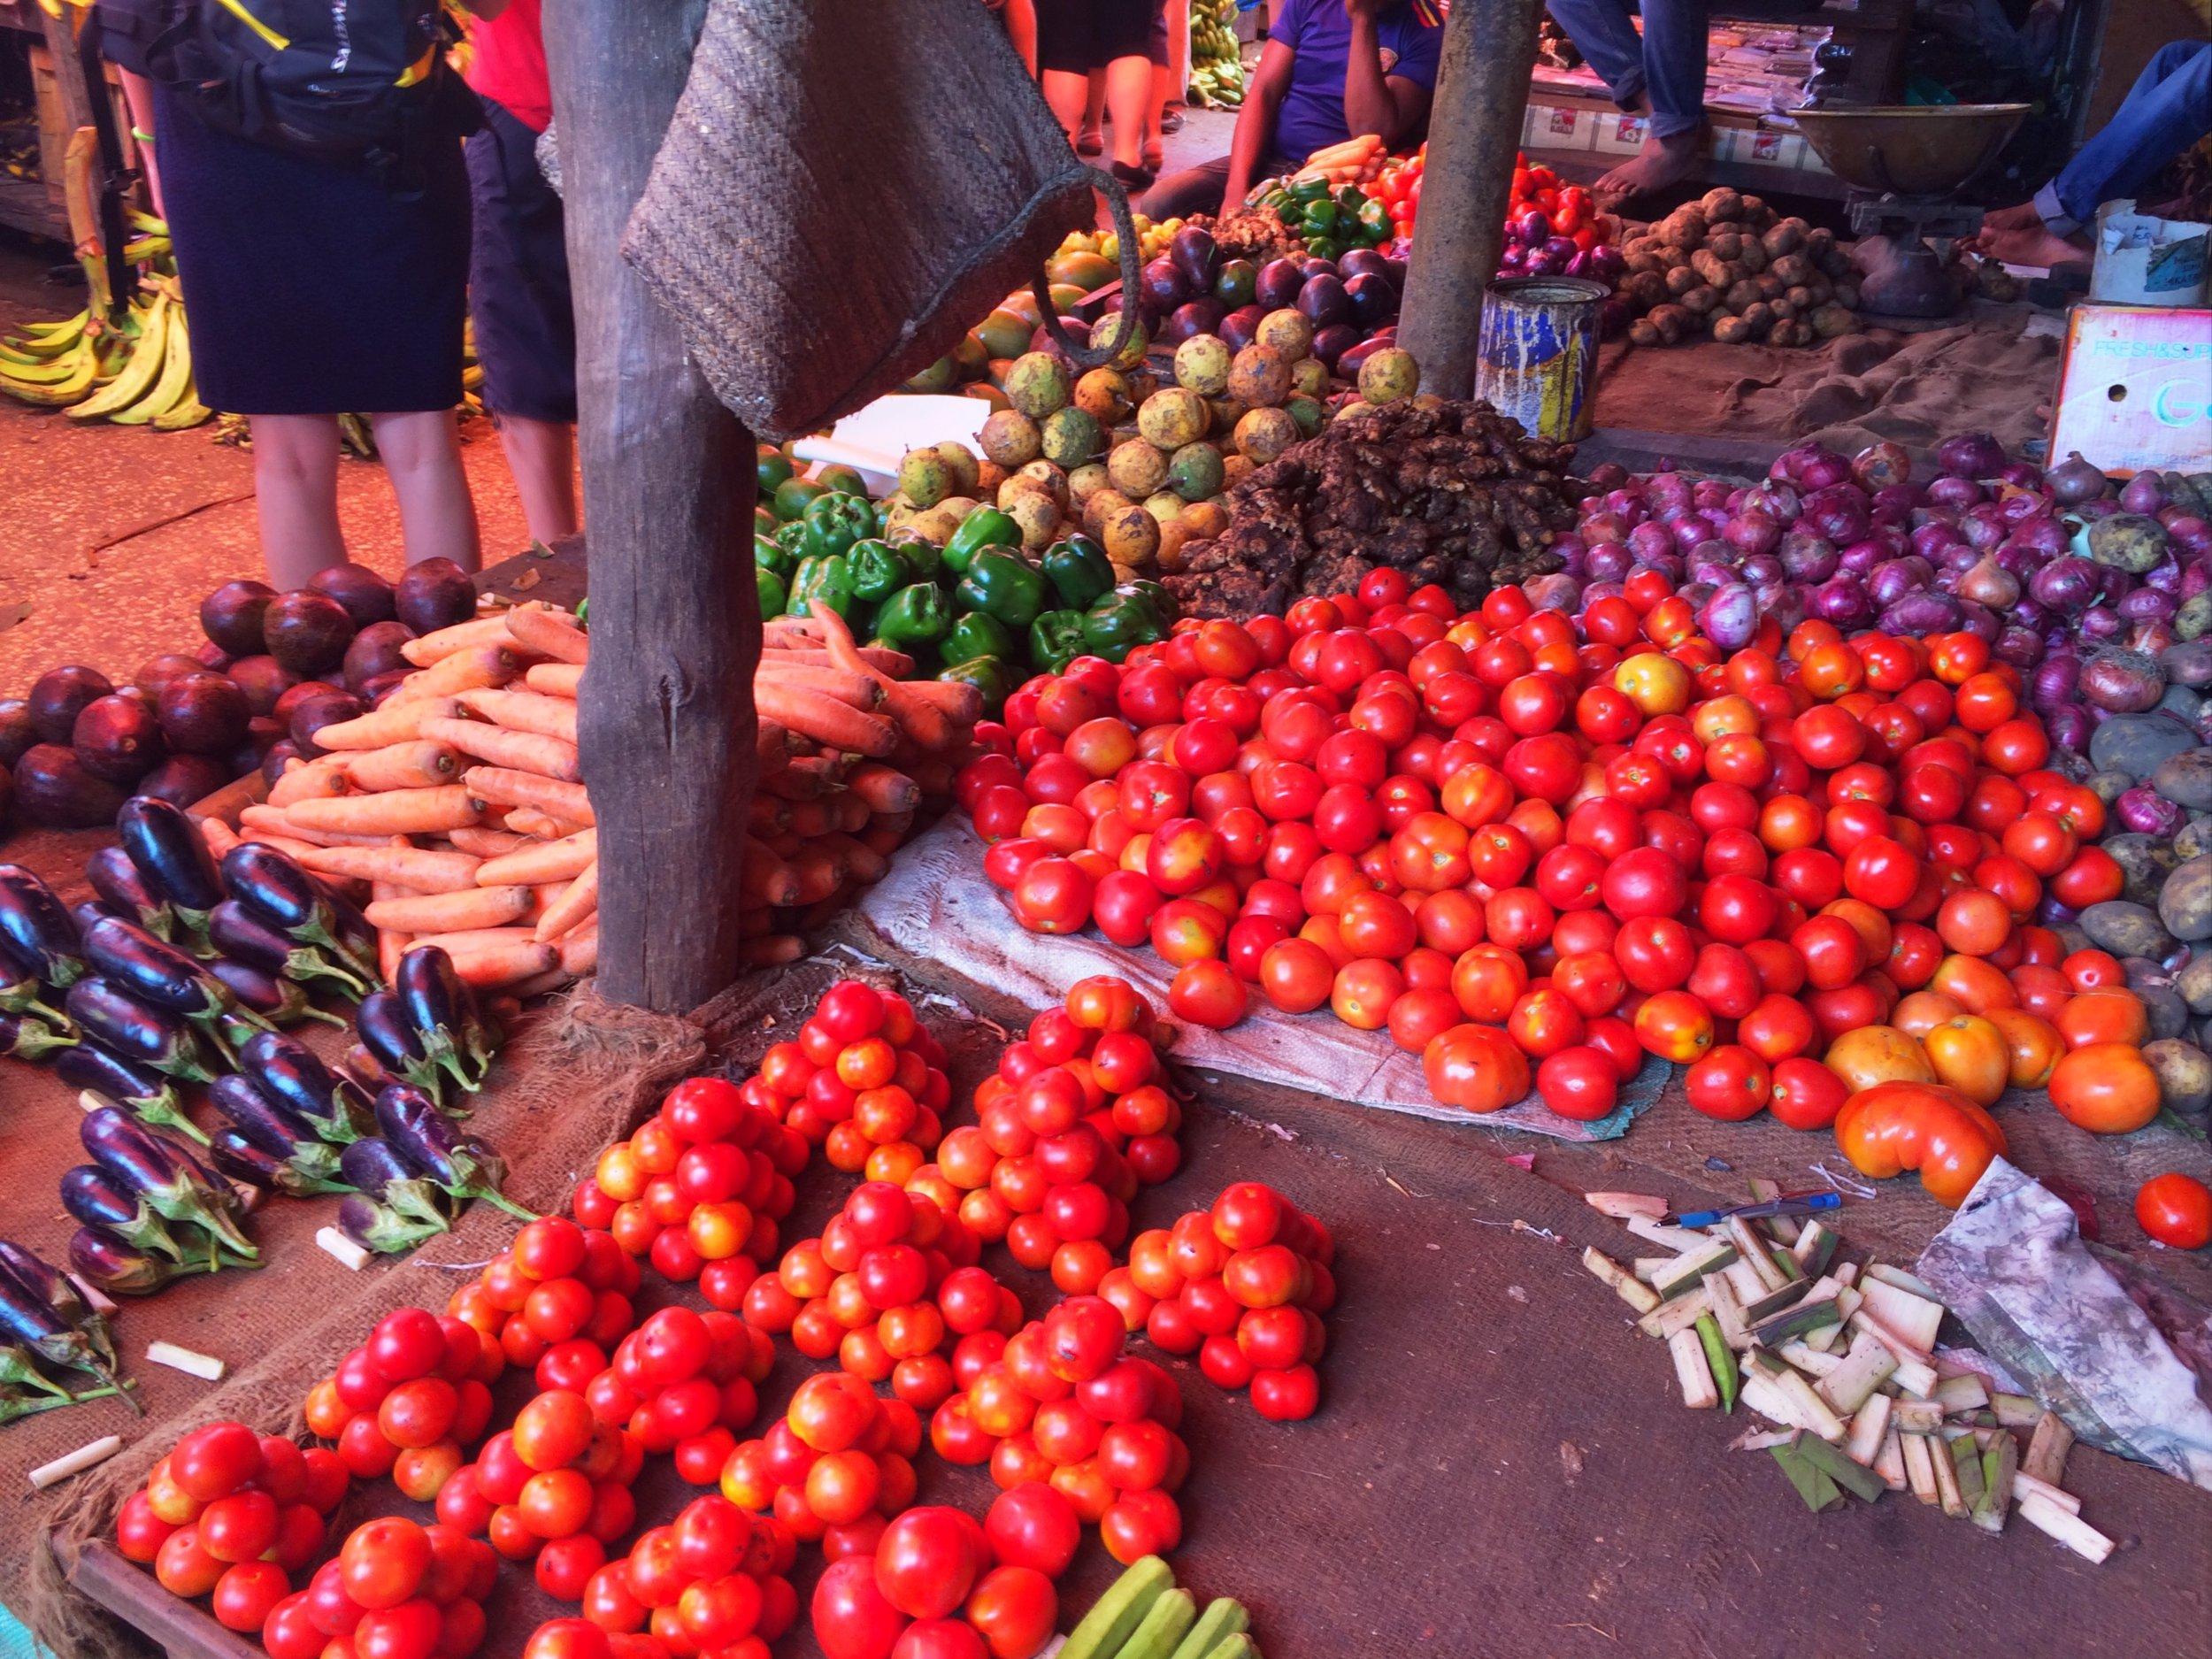 More vegetables at Zanzibar's market